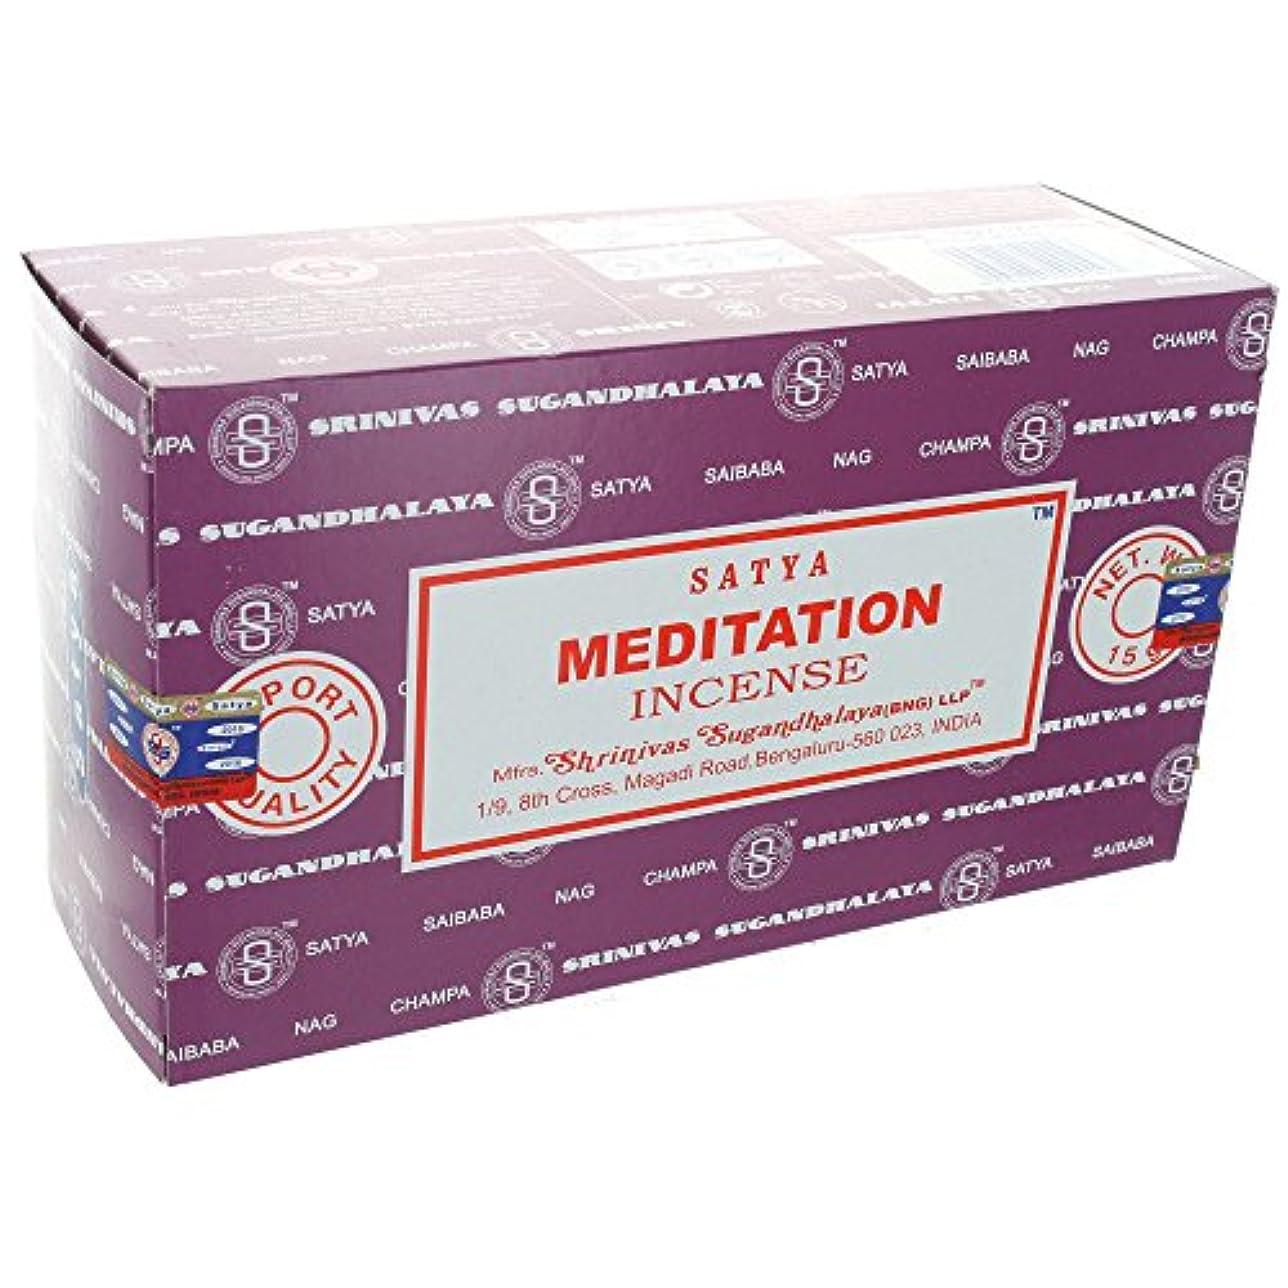 Satyaお香Meditation Incense Sticks 12 x 15グラム180グラム